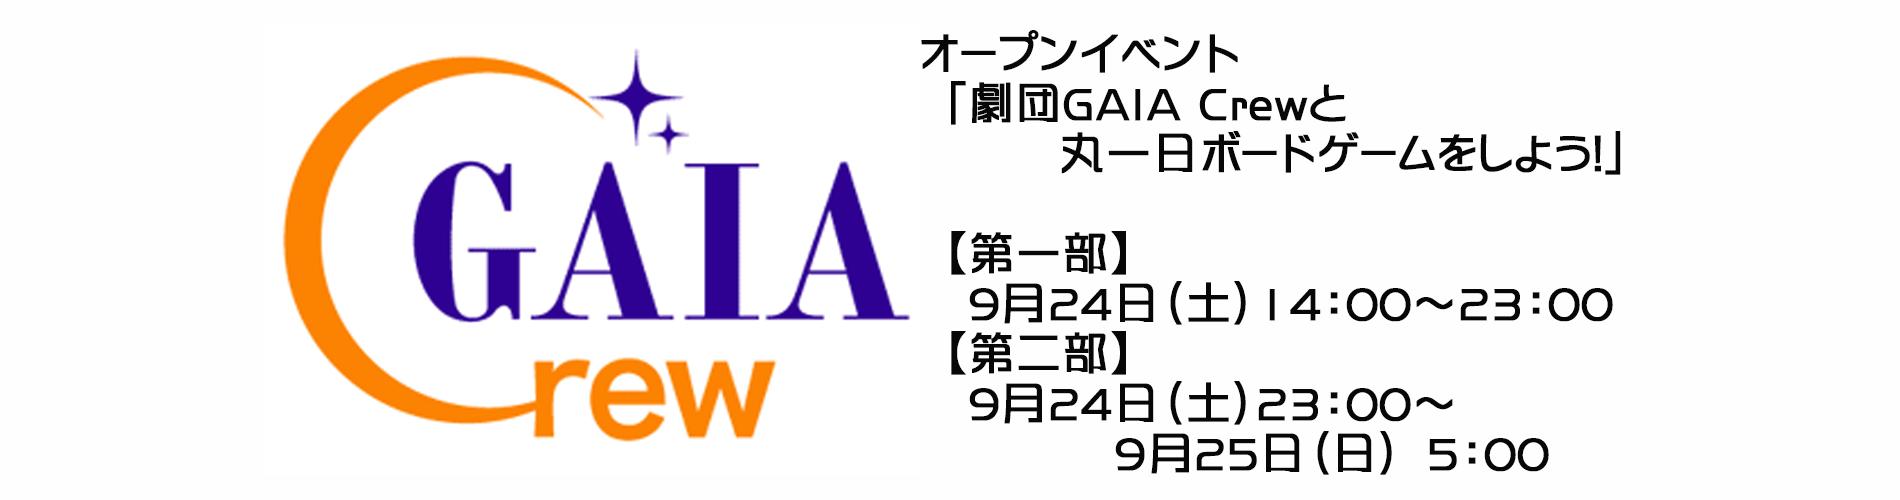 劇団GAIA Crew